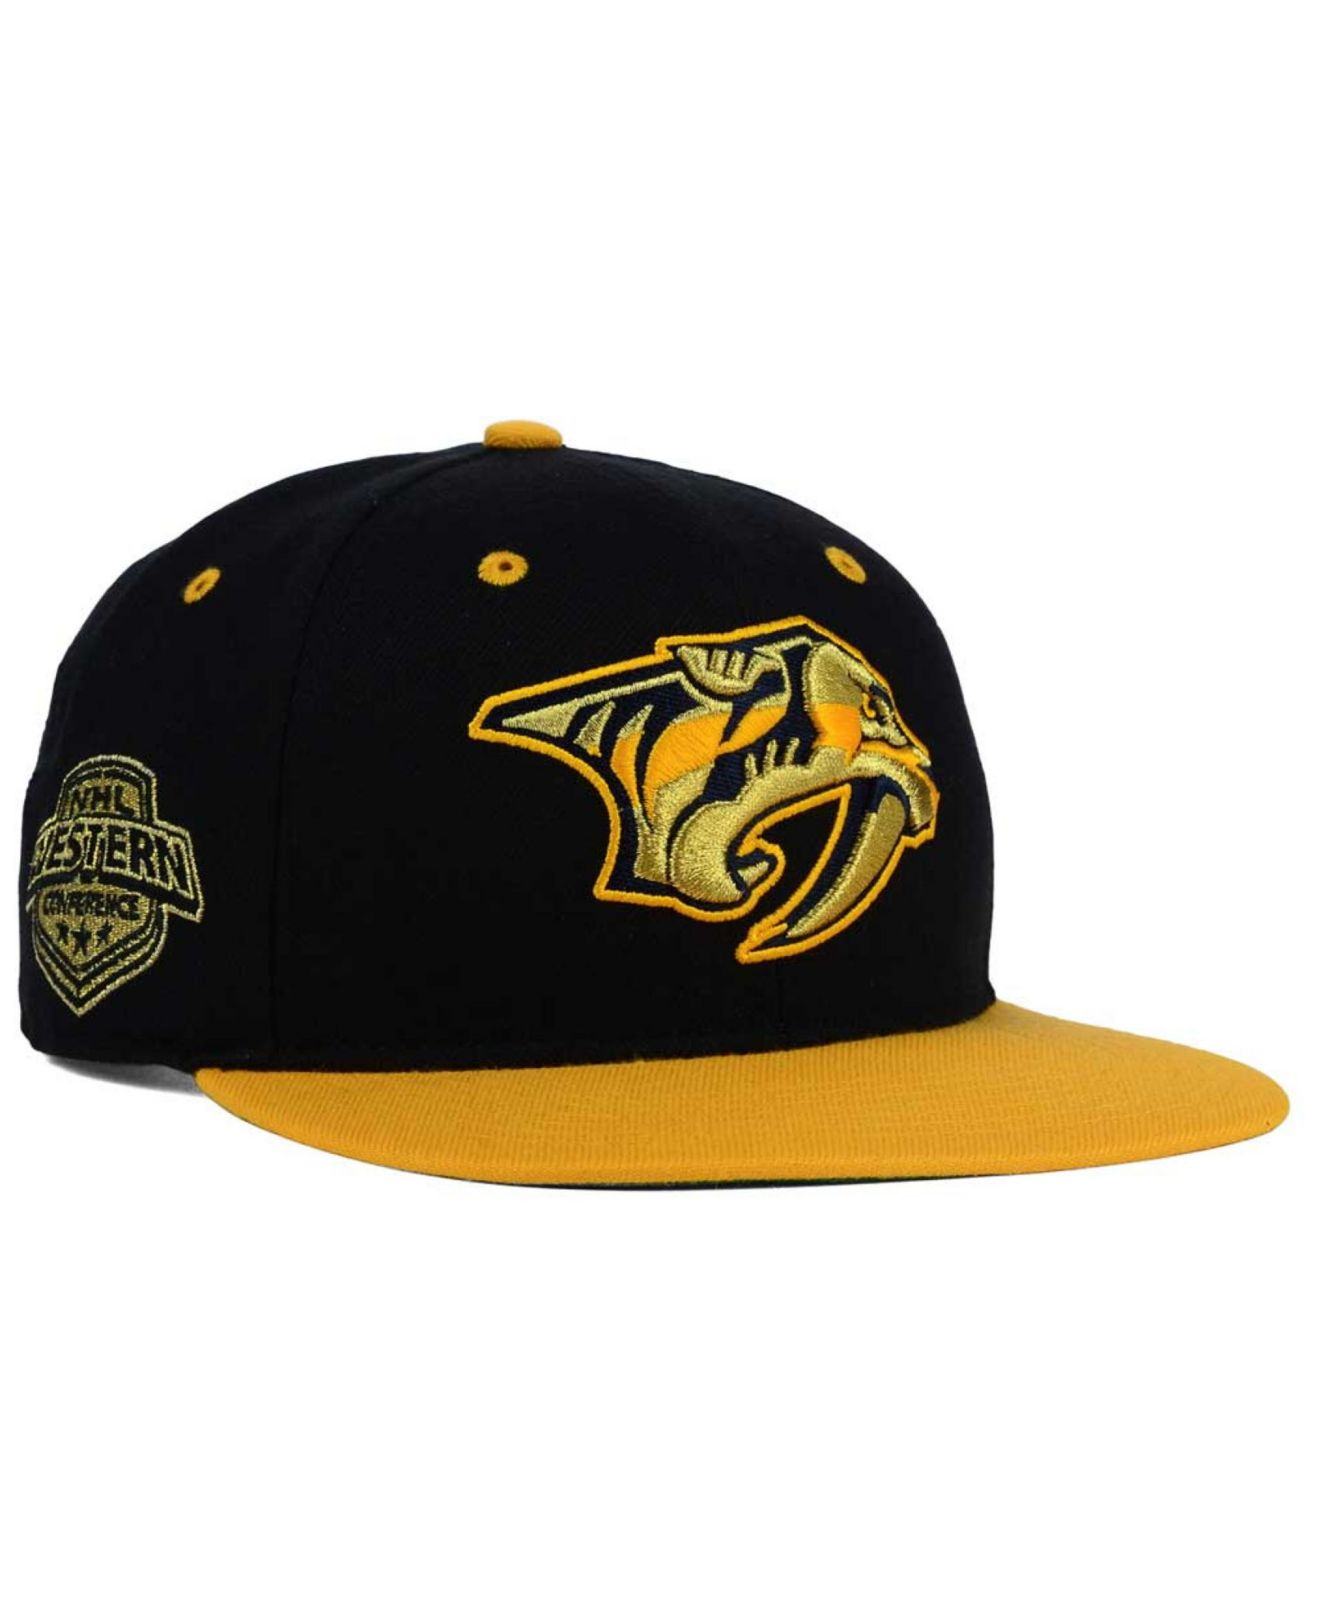 the latest add48 7b096 ... coupon code for lyst 47 brand nashville predators gold rush snapback cap  in black for men